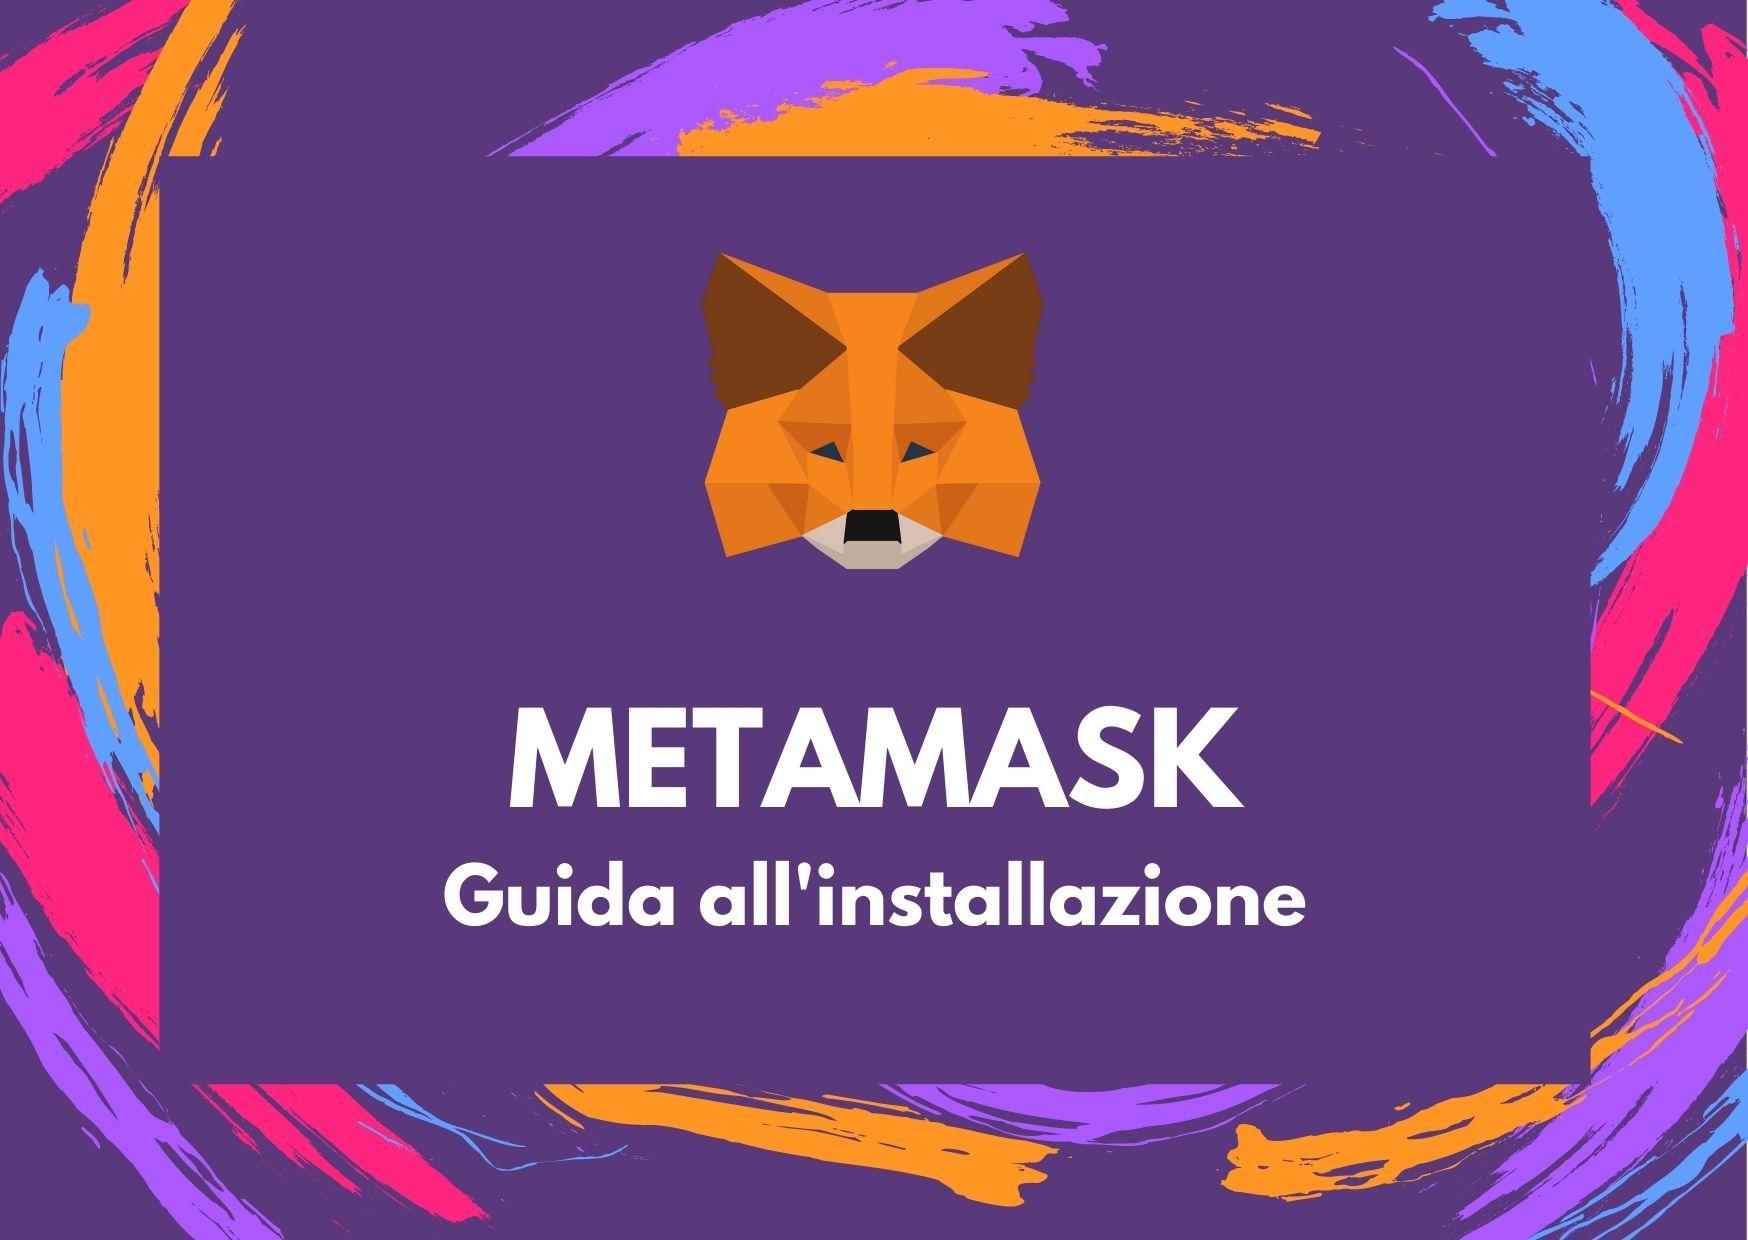 METAMASK Guida all'installazione